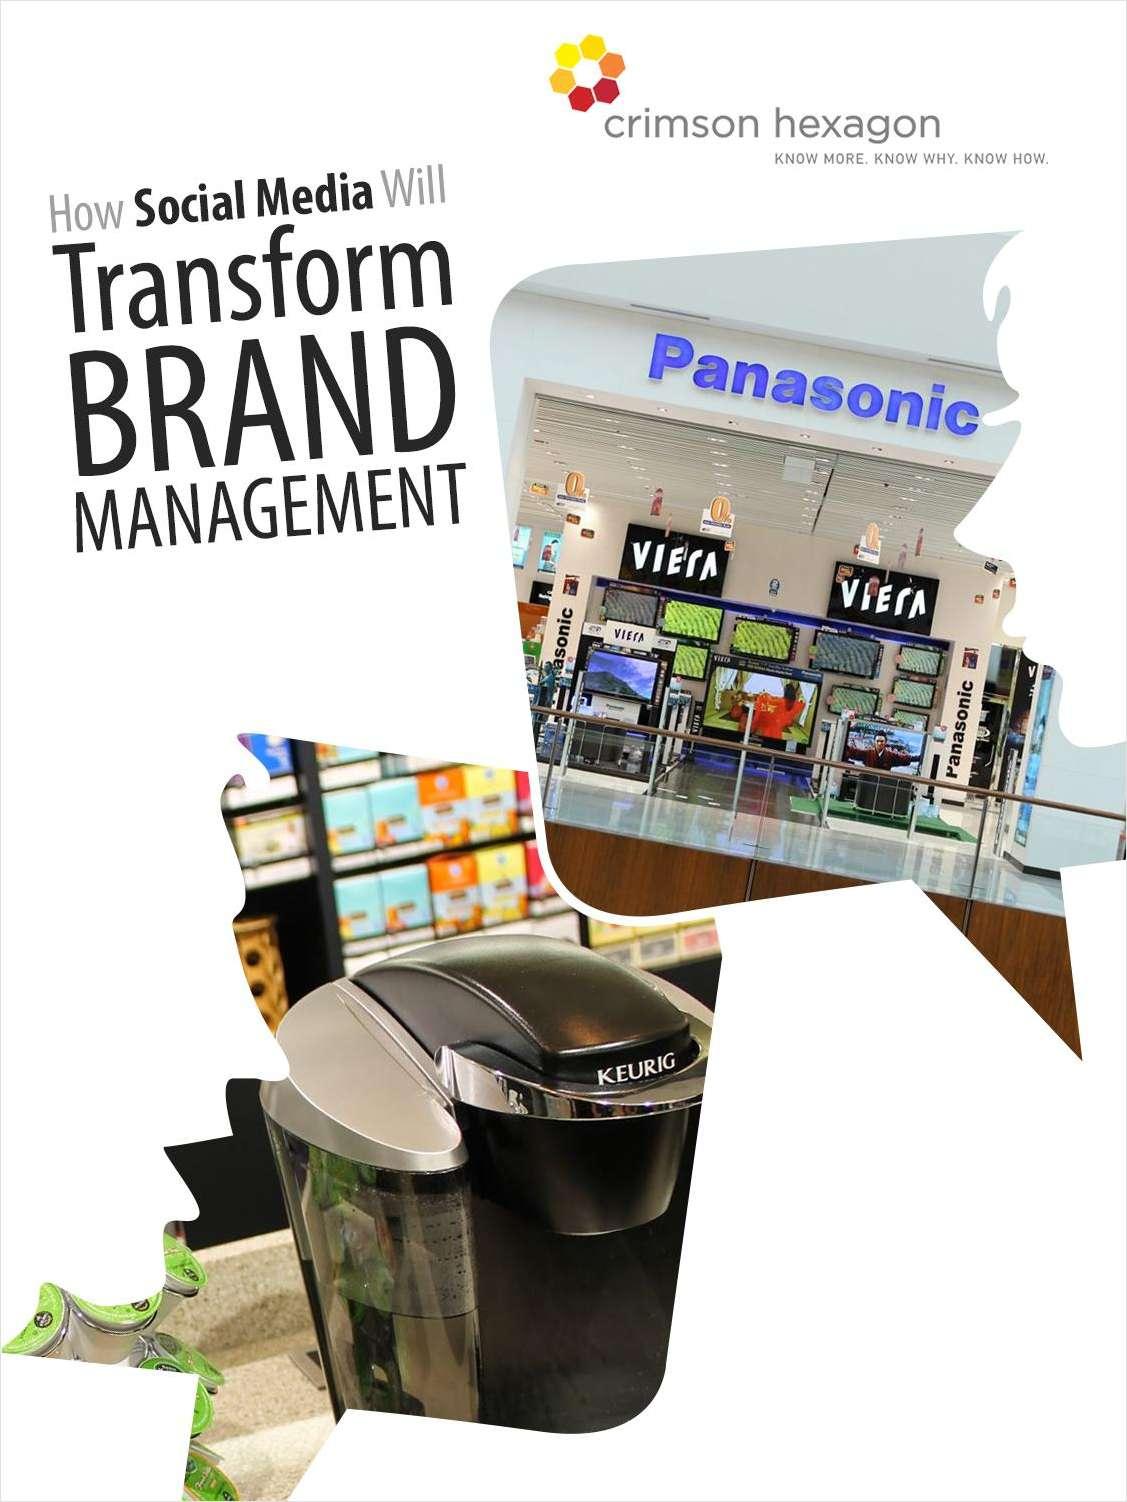 How Social Media Will Transform Brand Management